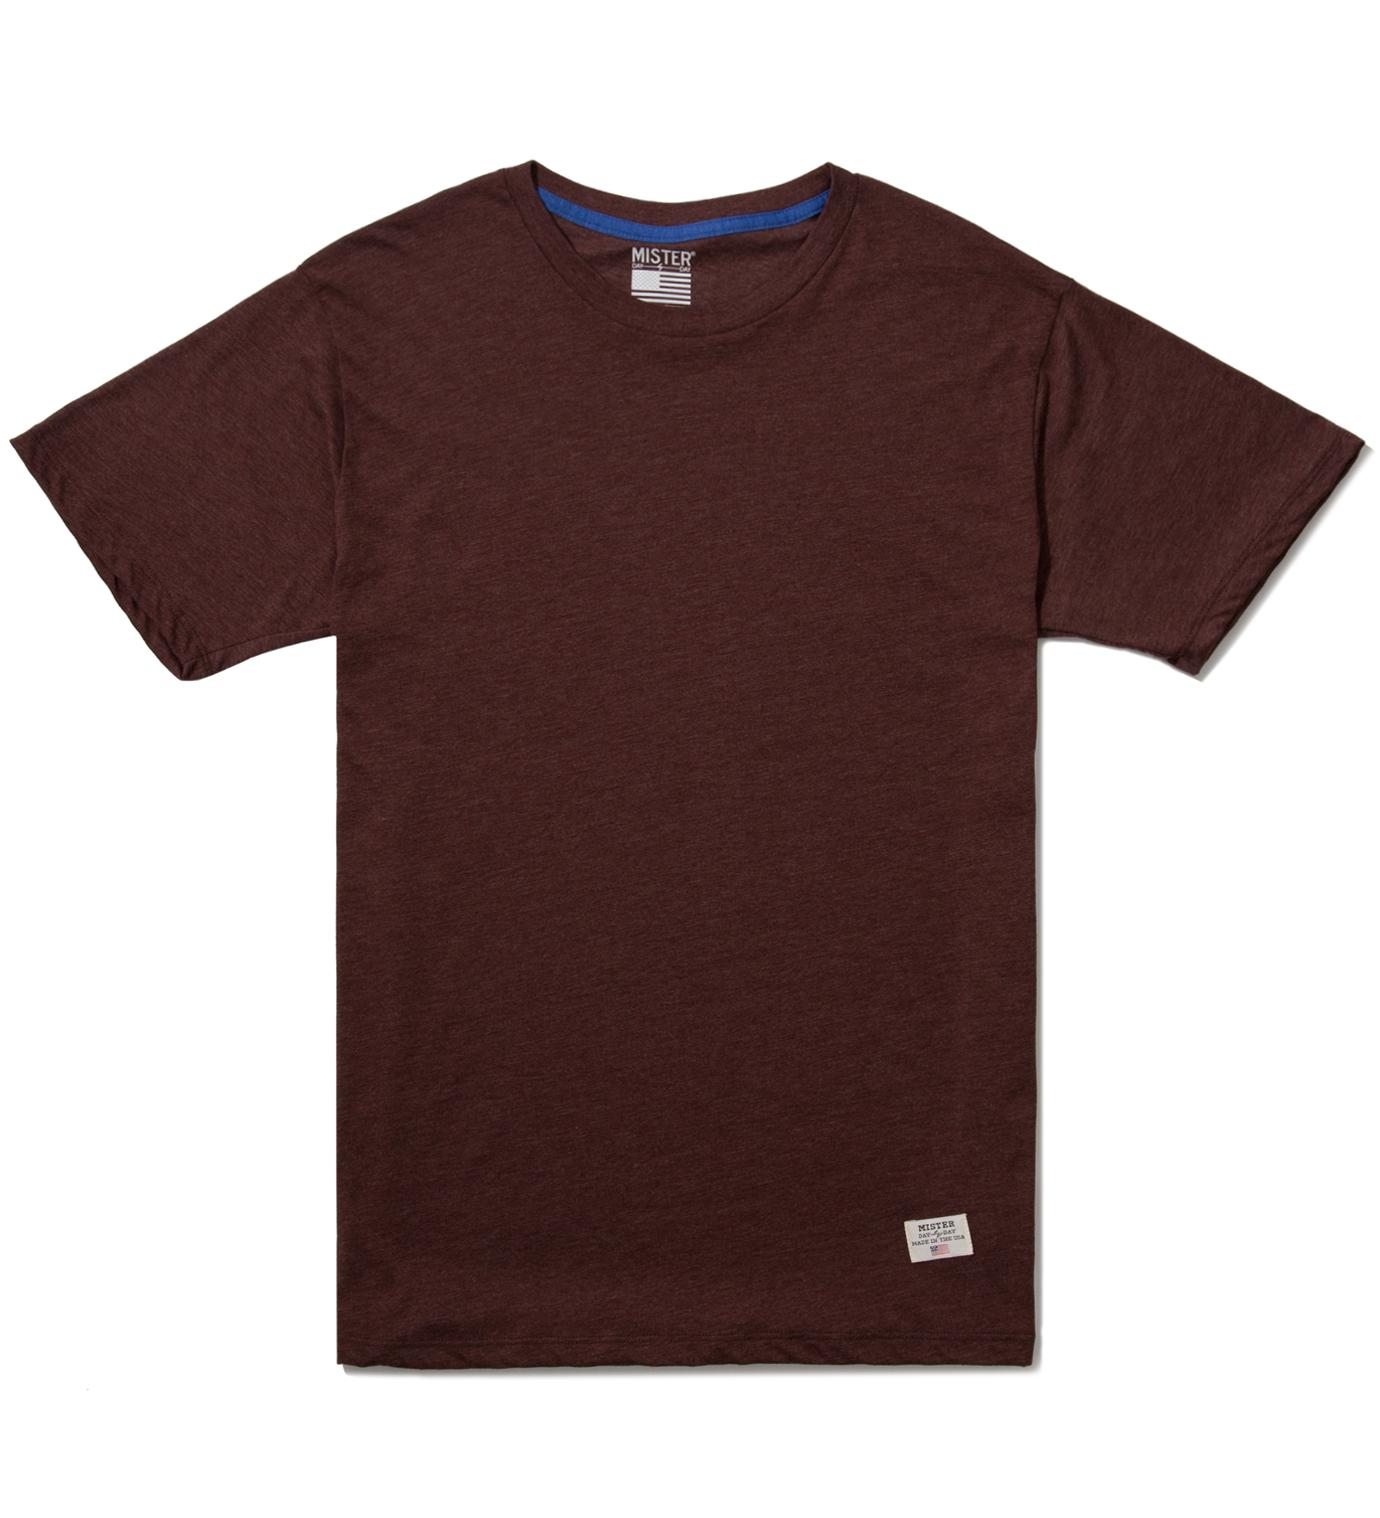 Mister Wine Mr. Tee Immediate T-Shirt